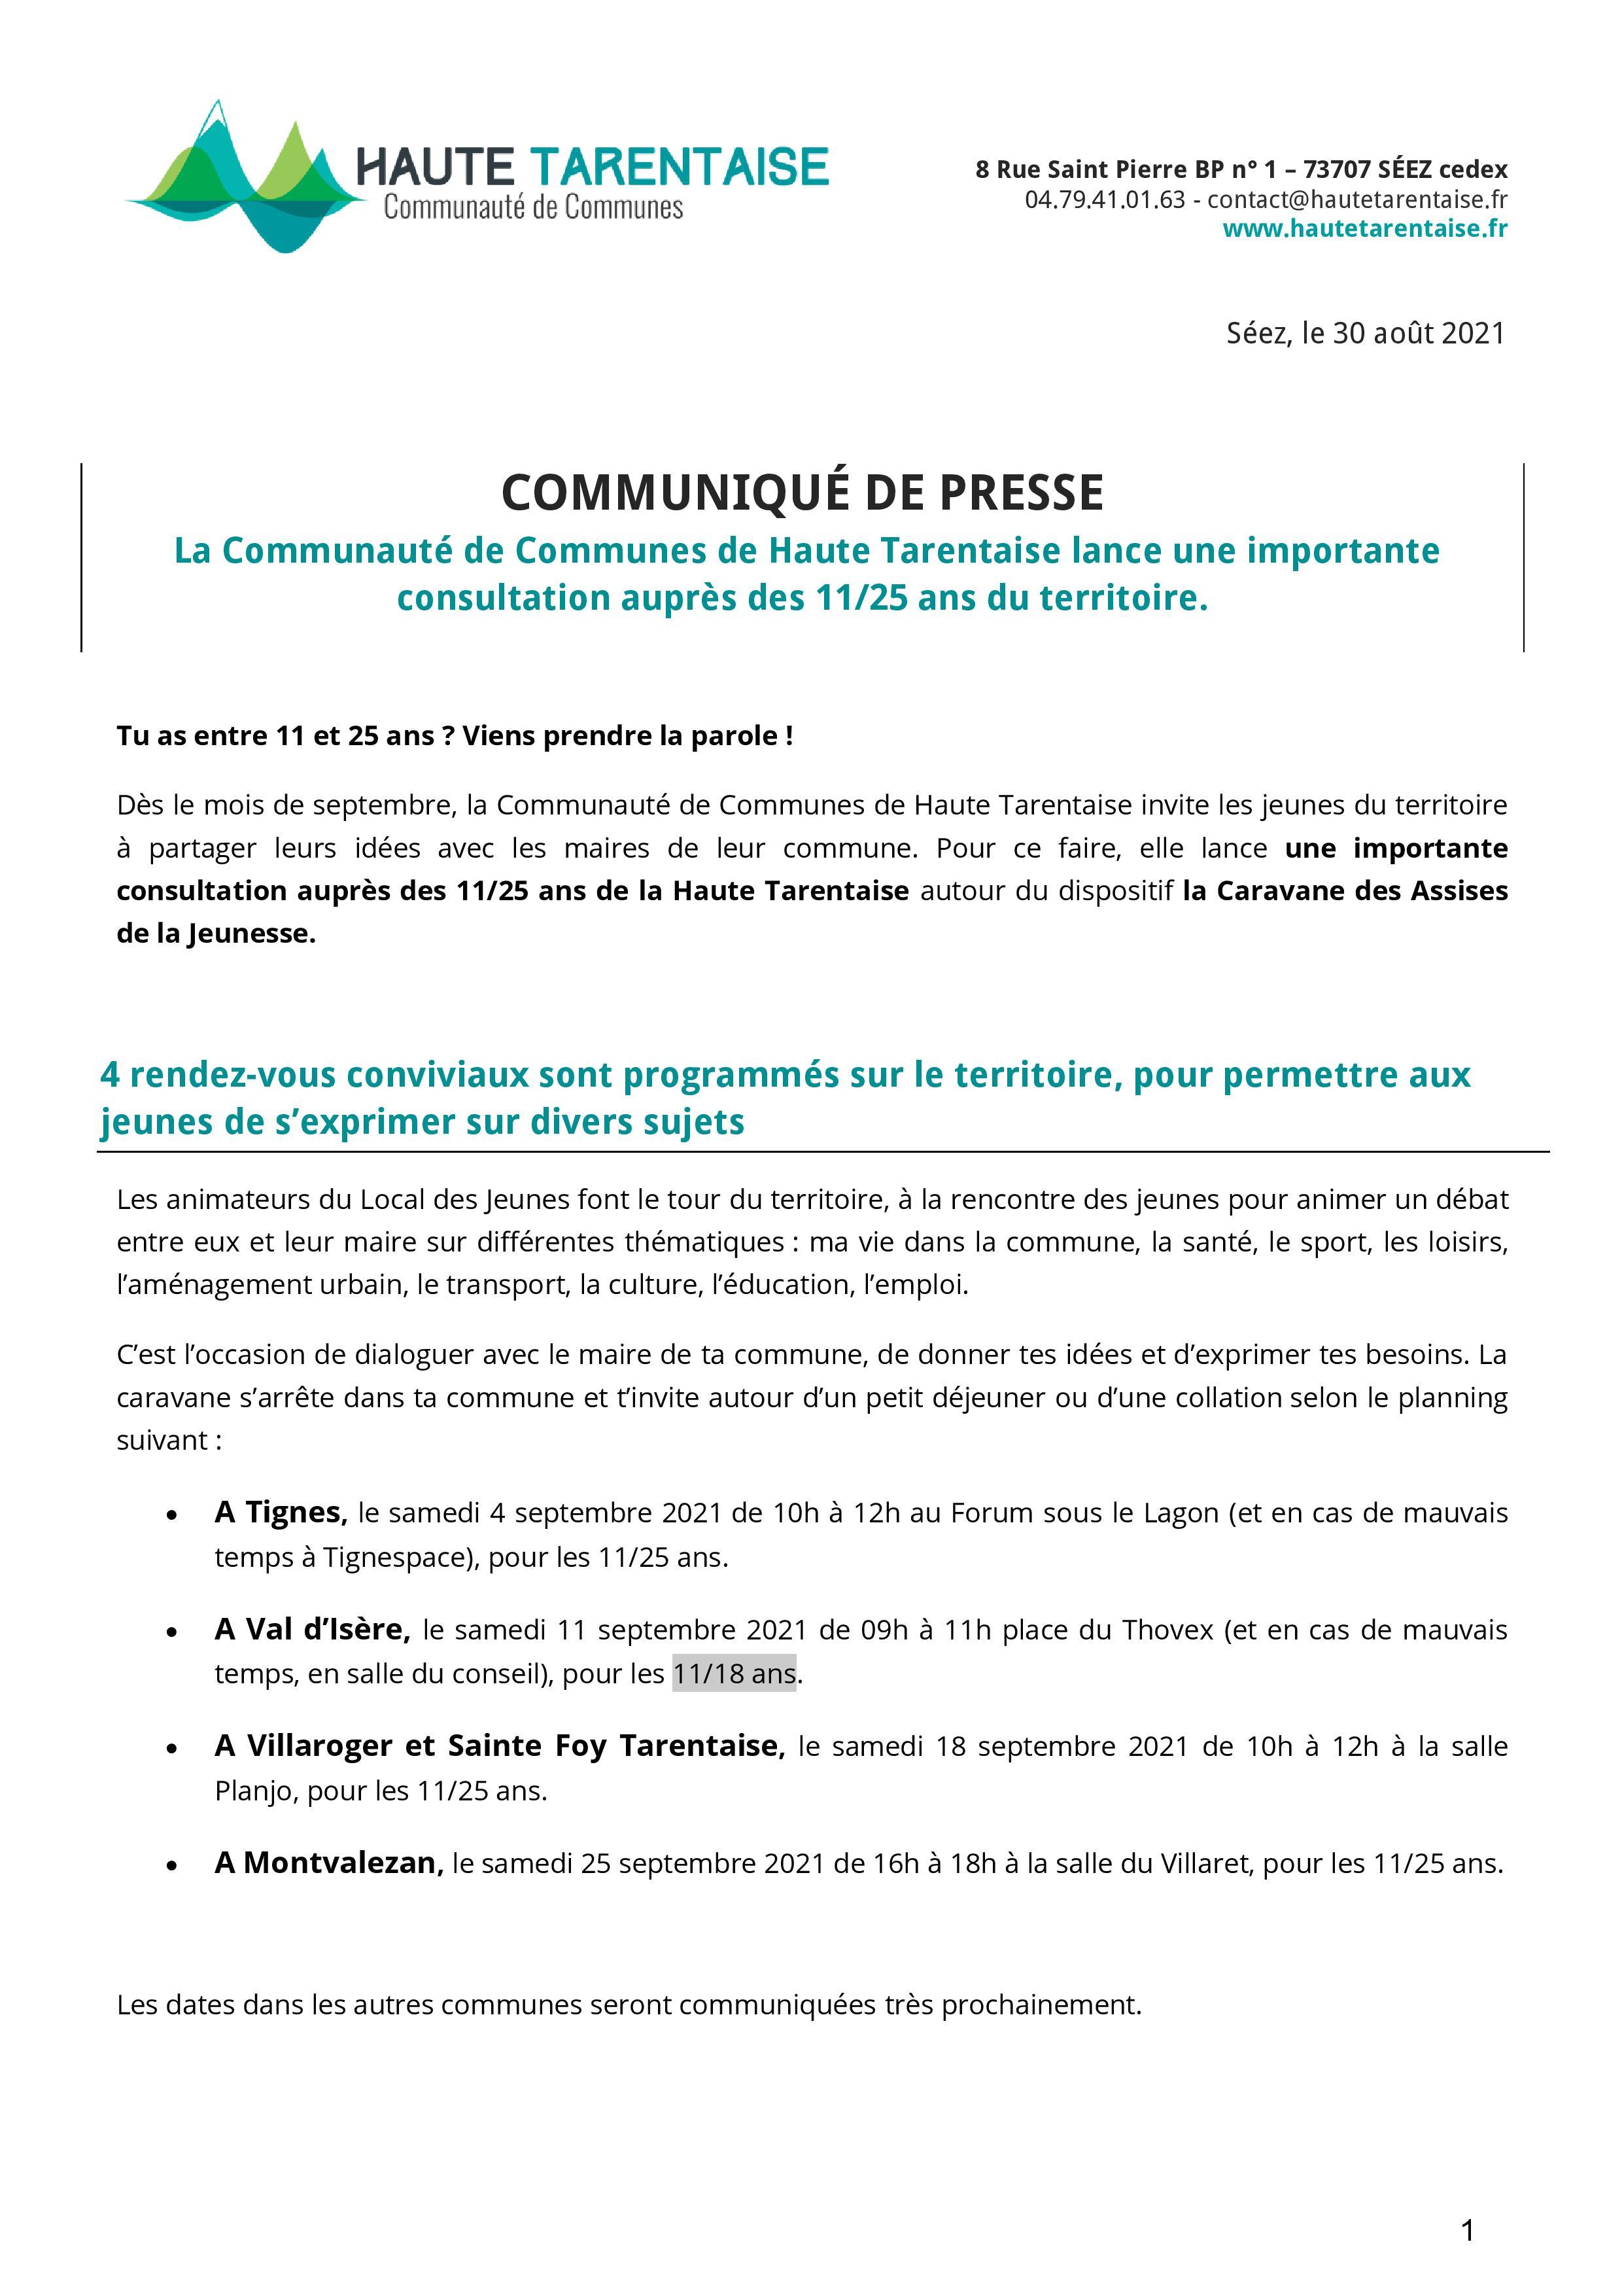 CP_caravane_assises_jeunesse_30.08.21-page-001 _1_.jpg